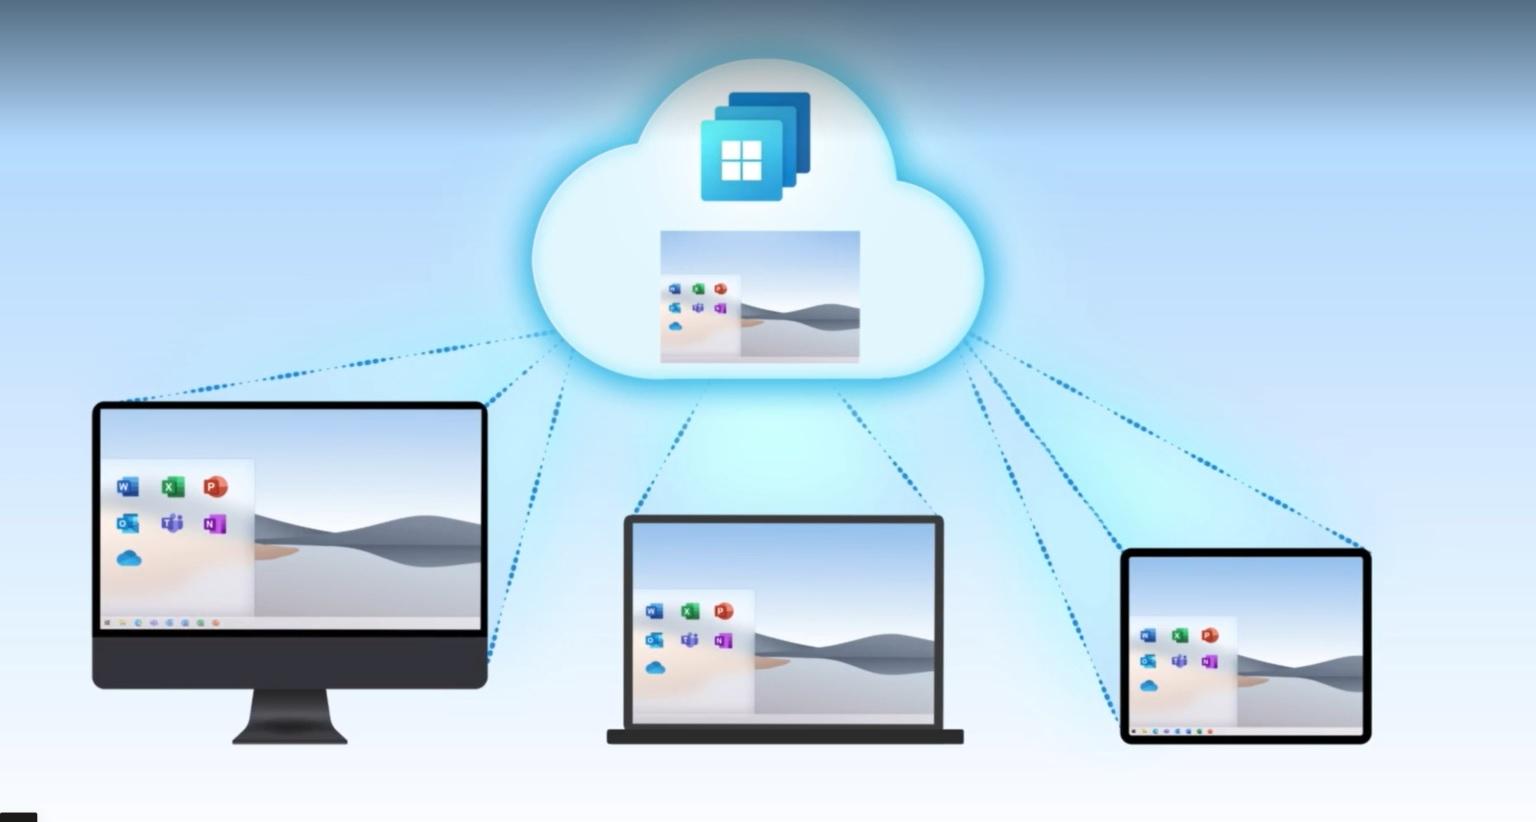 Microsoft Announces Windows 365 Cloud PC to Help Organizations Embrace a Hybrid Work Culture Post-Pandemic